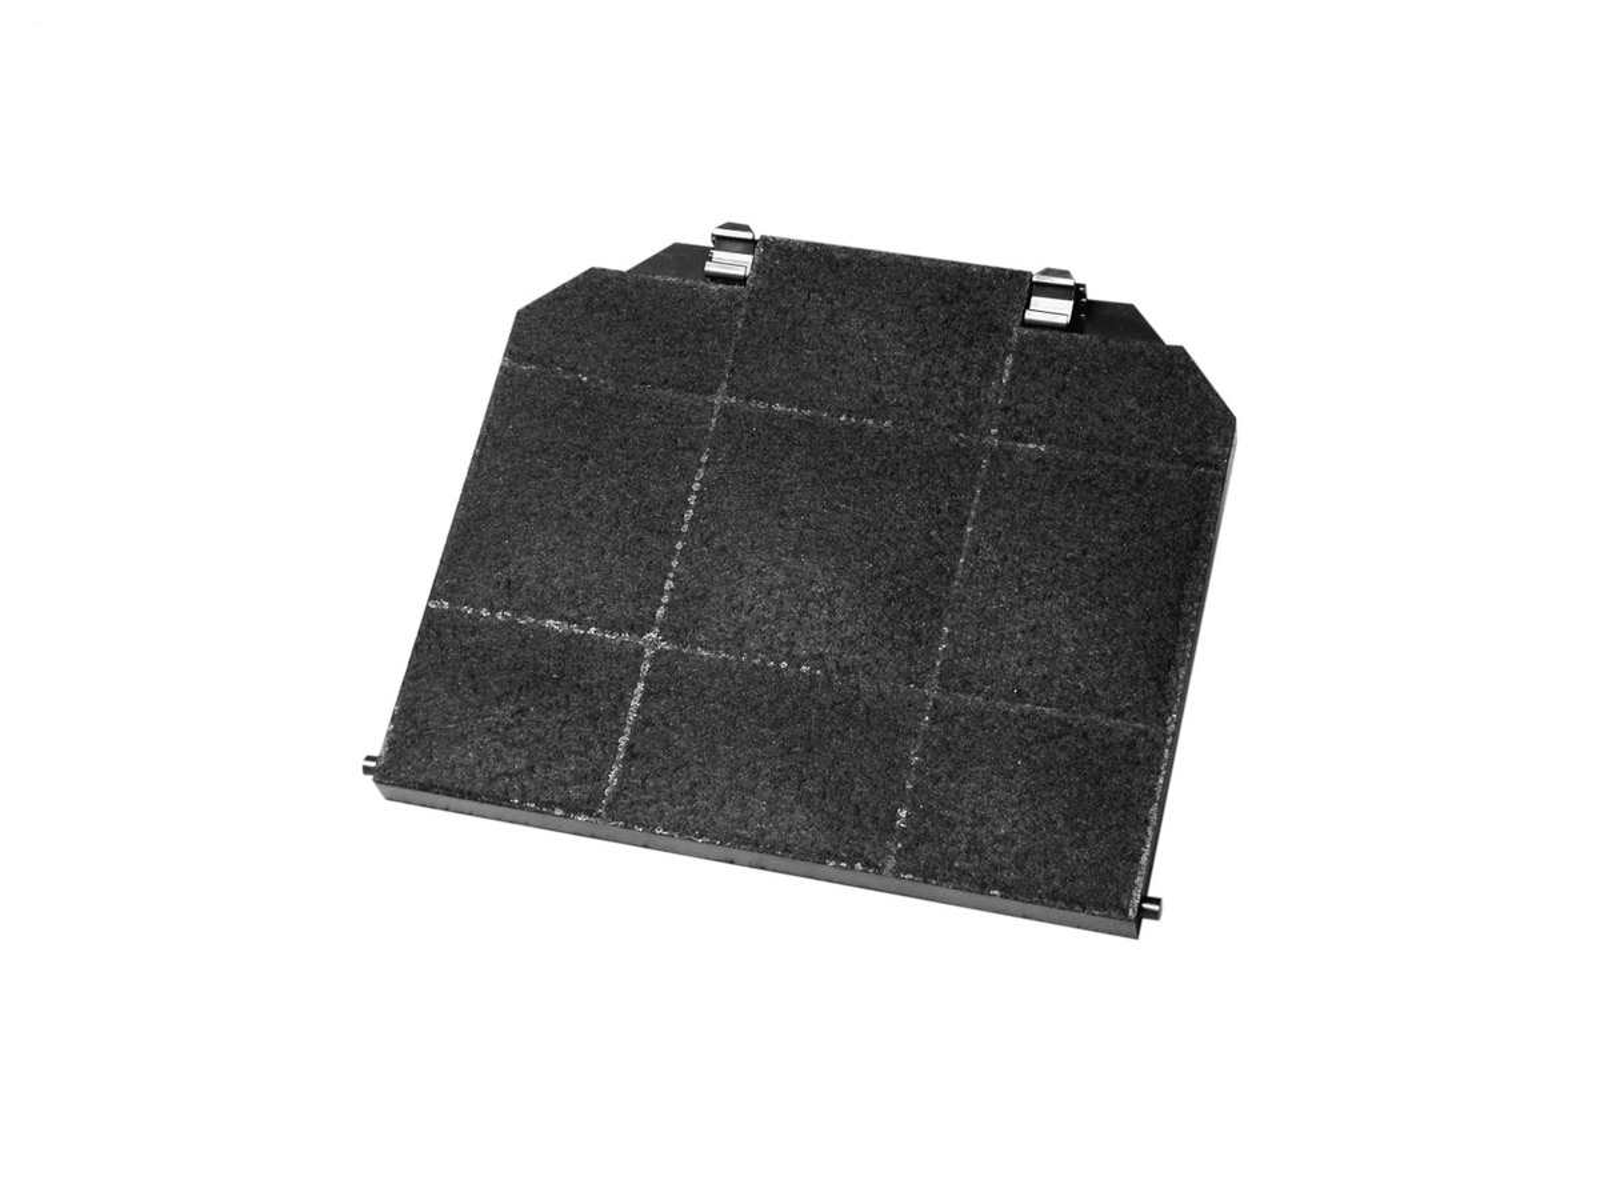 Kohlefilter dunstabzugshaube reinigen kohlefilter alternative